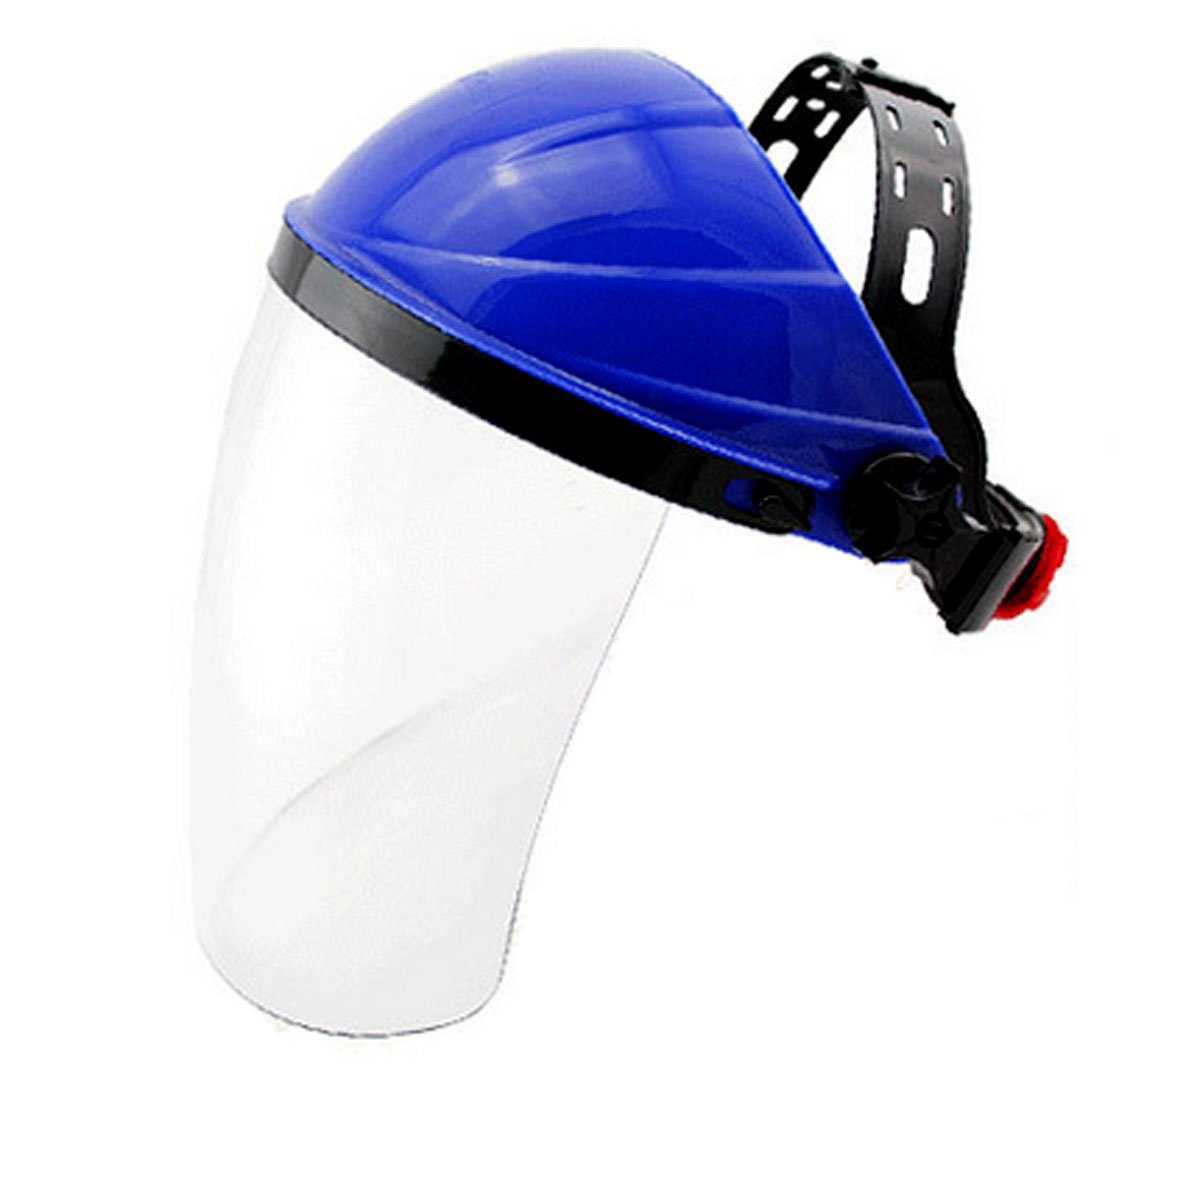 JOYOOO Enhanced Protective Mask Protective Face Masks Against Chemical Splash Screen Anti-shock Laboratory Spray